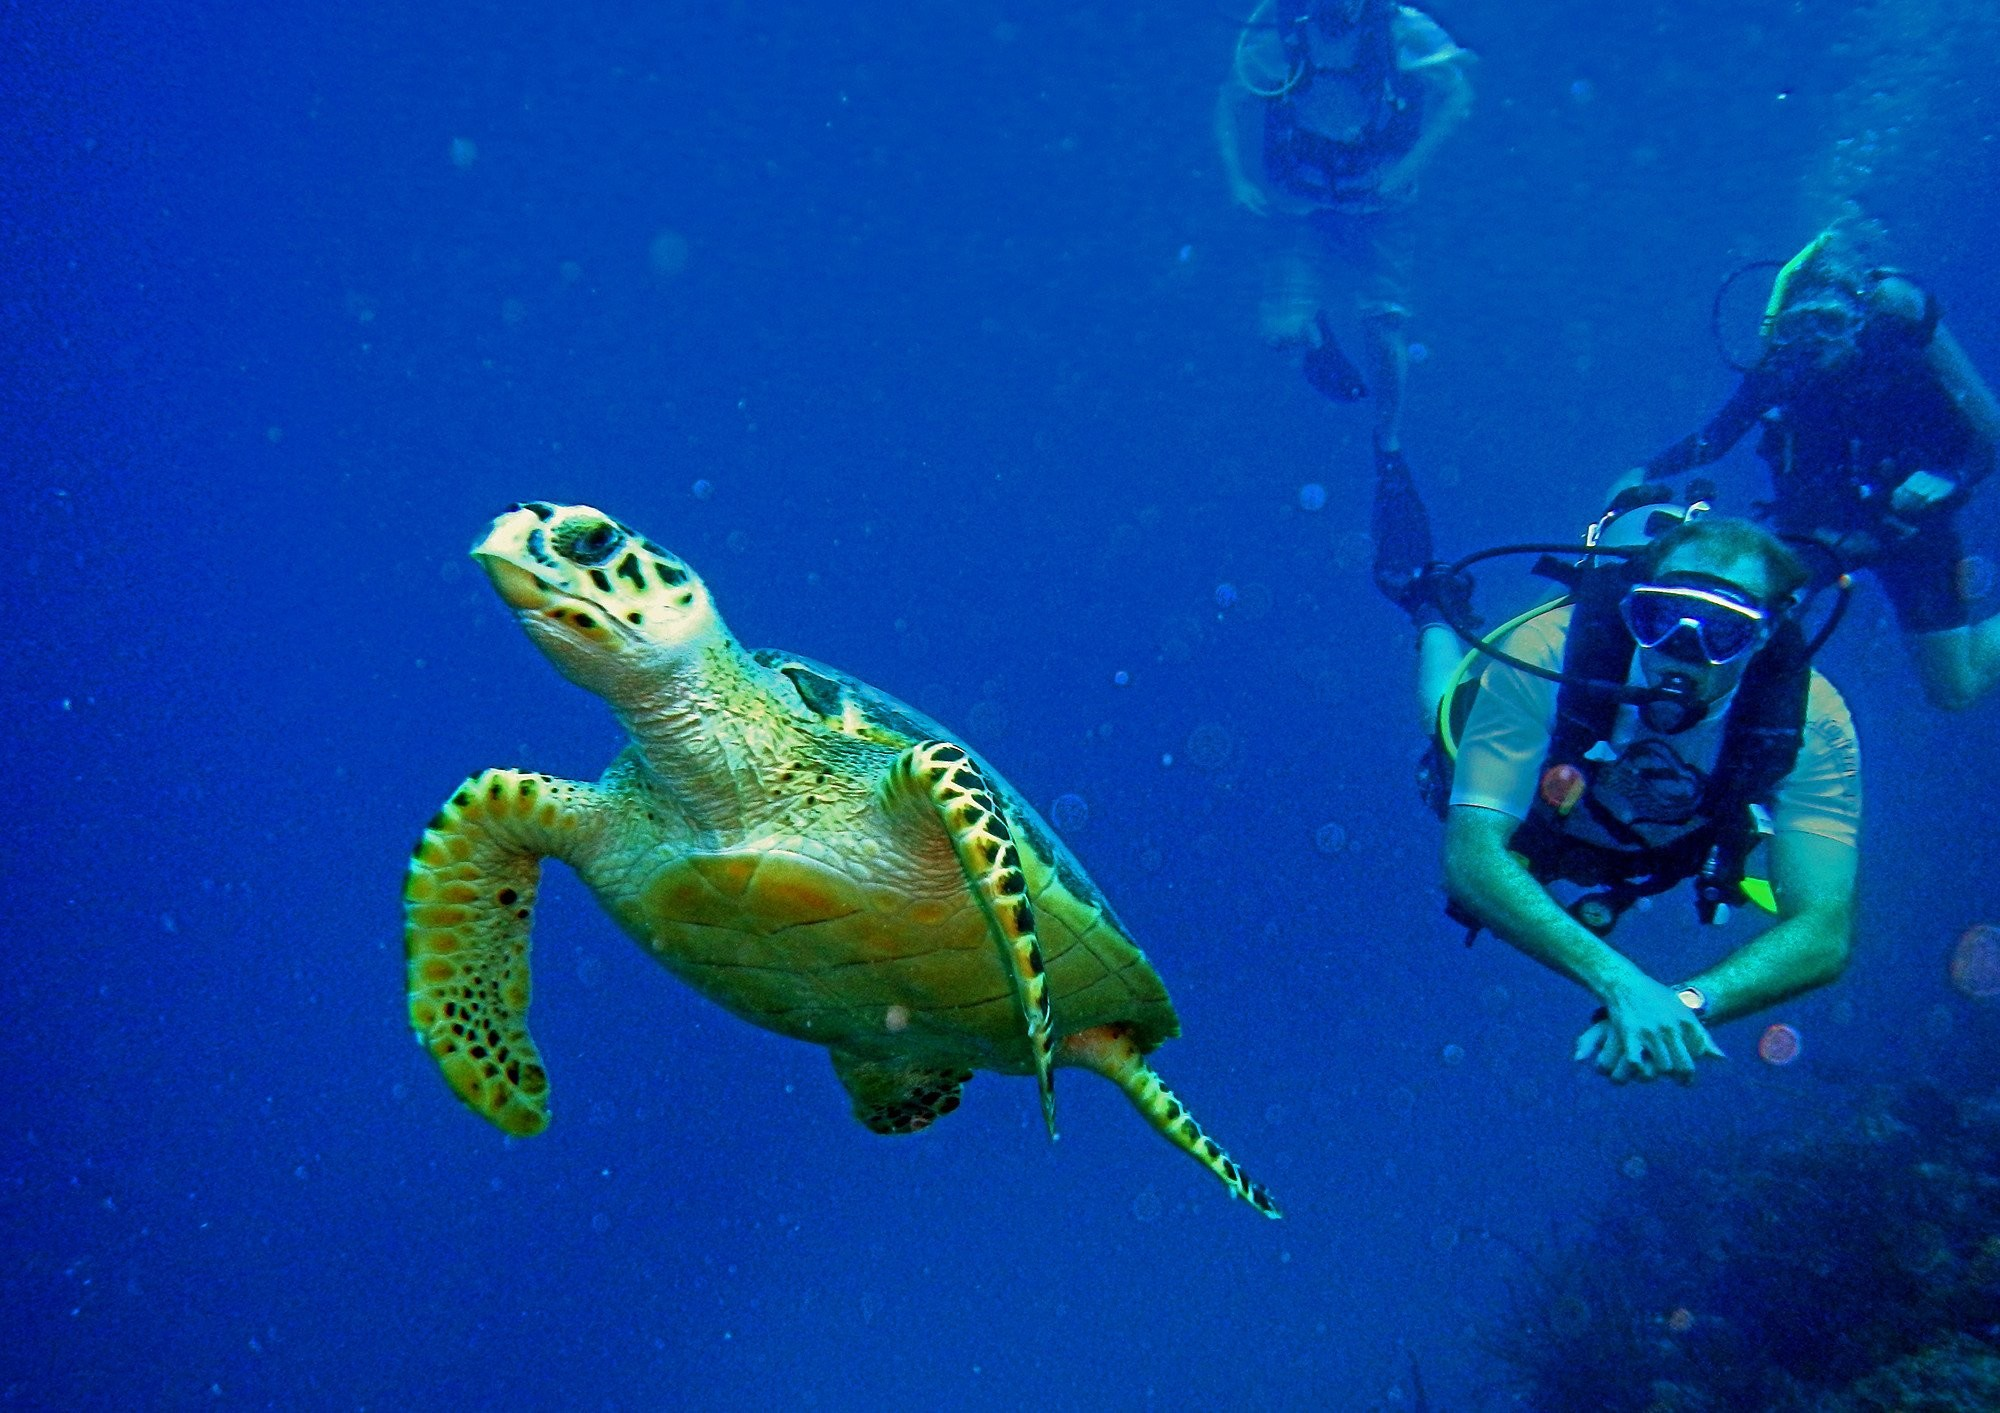 scuba diving wallpaper wallpapers - photo #45